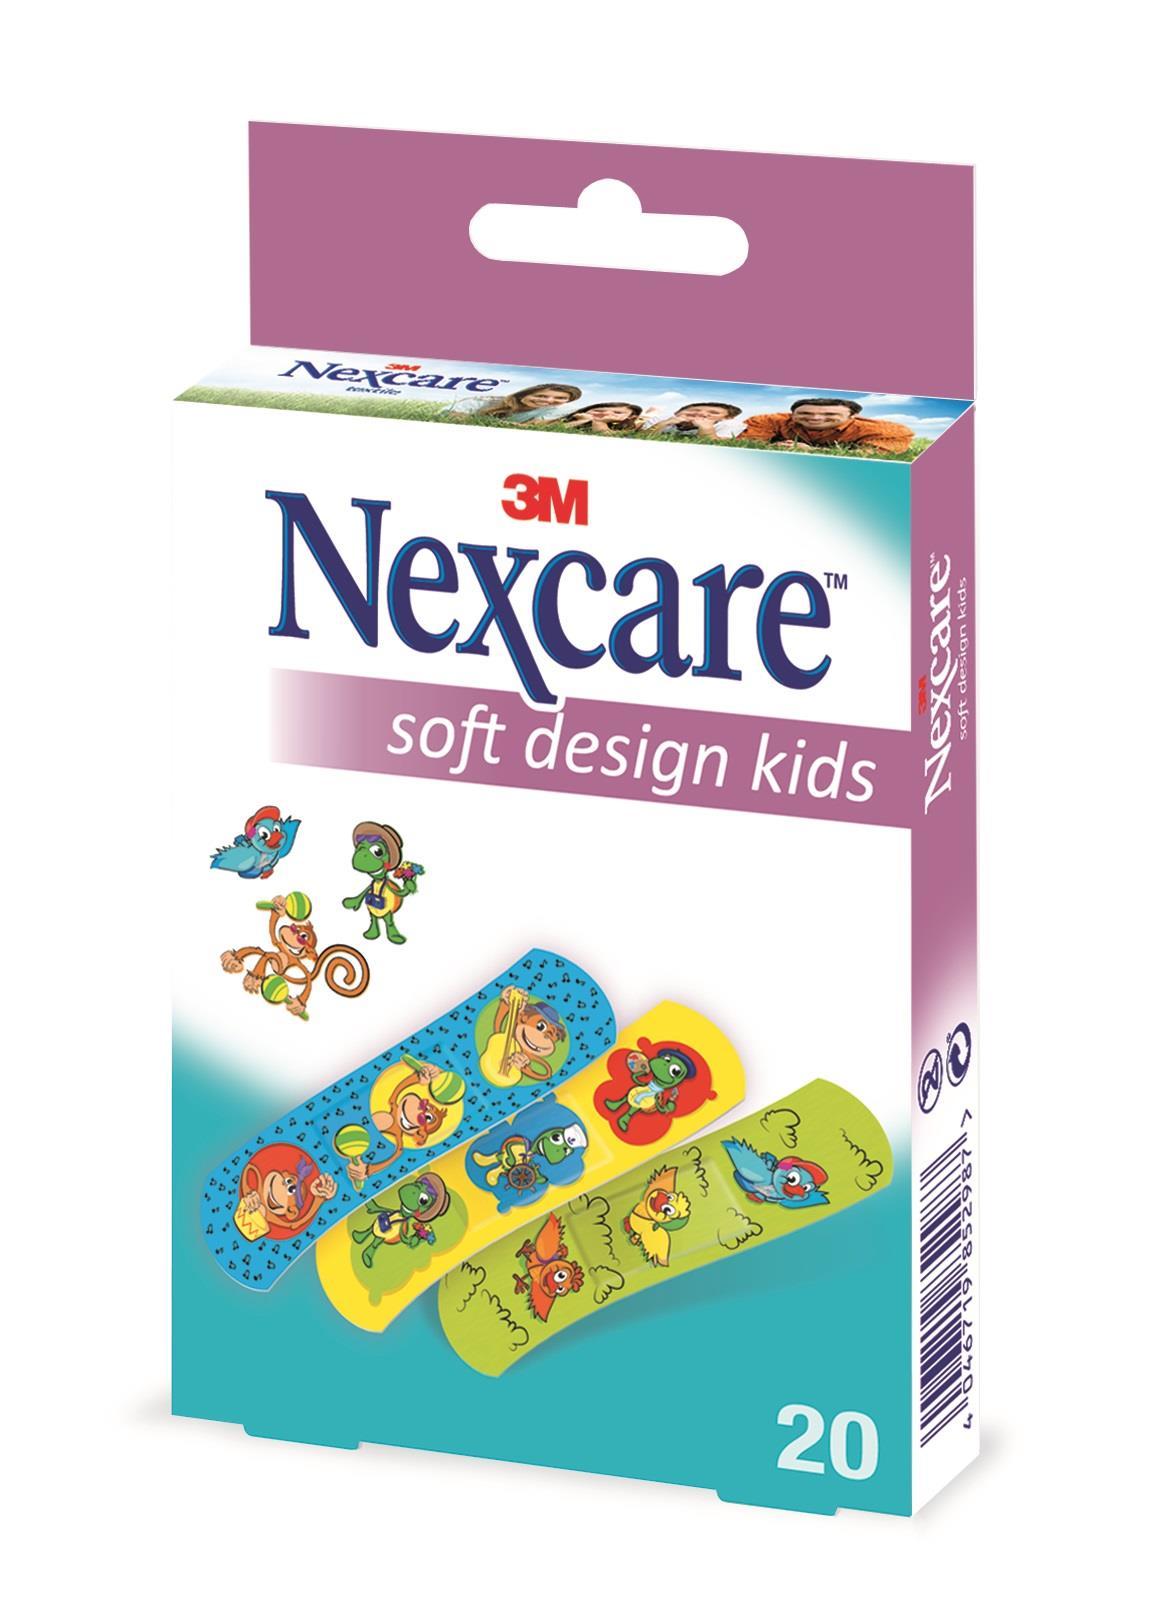 3M Nexcare Kinderpflaster Soft Kids Design